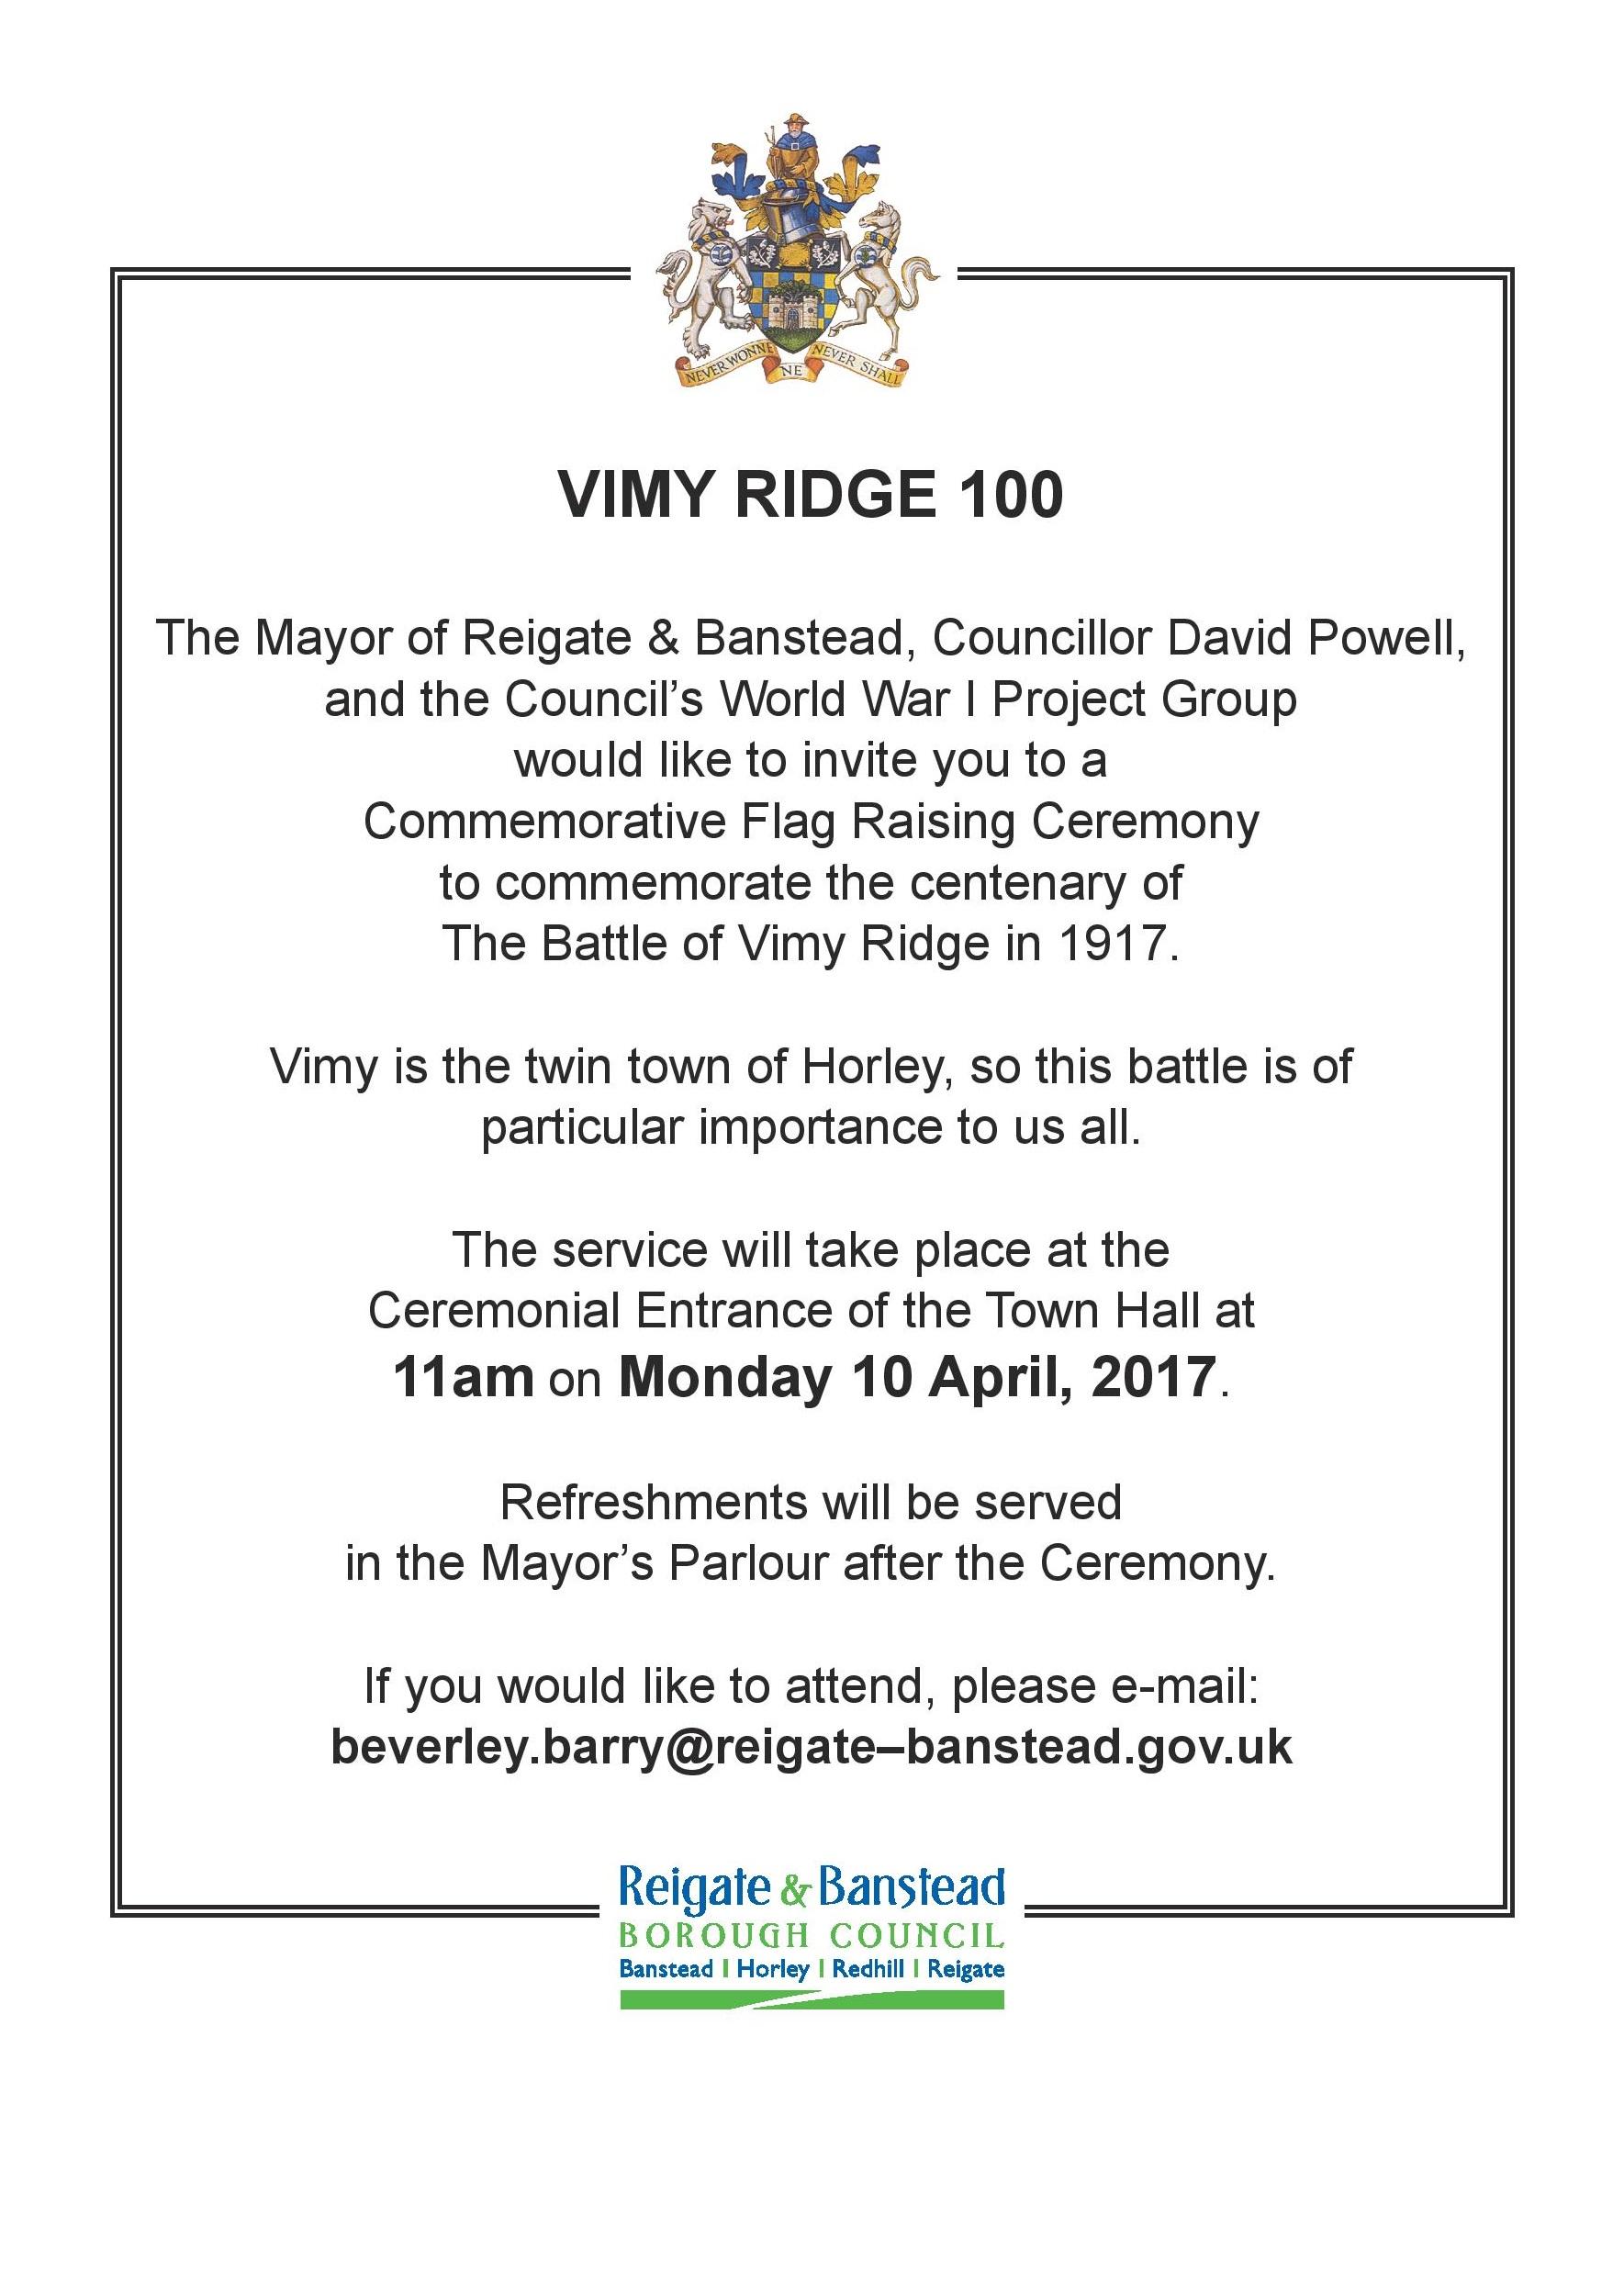 April 10, Reigate & Banstead, UK - Vimy Ridge 100